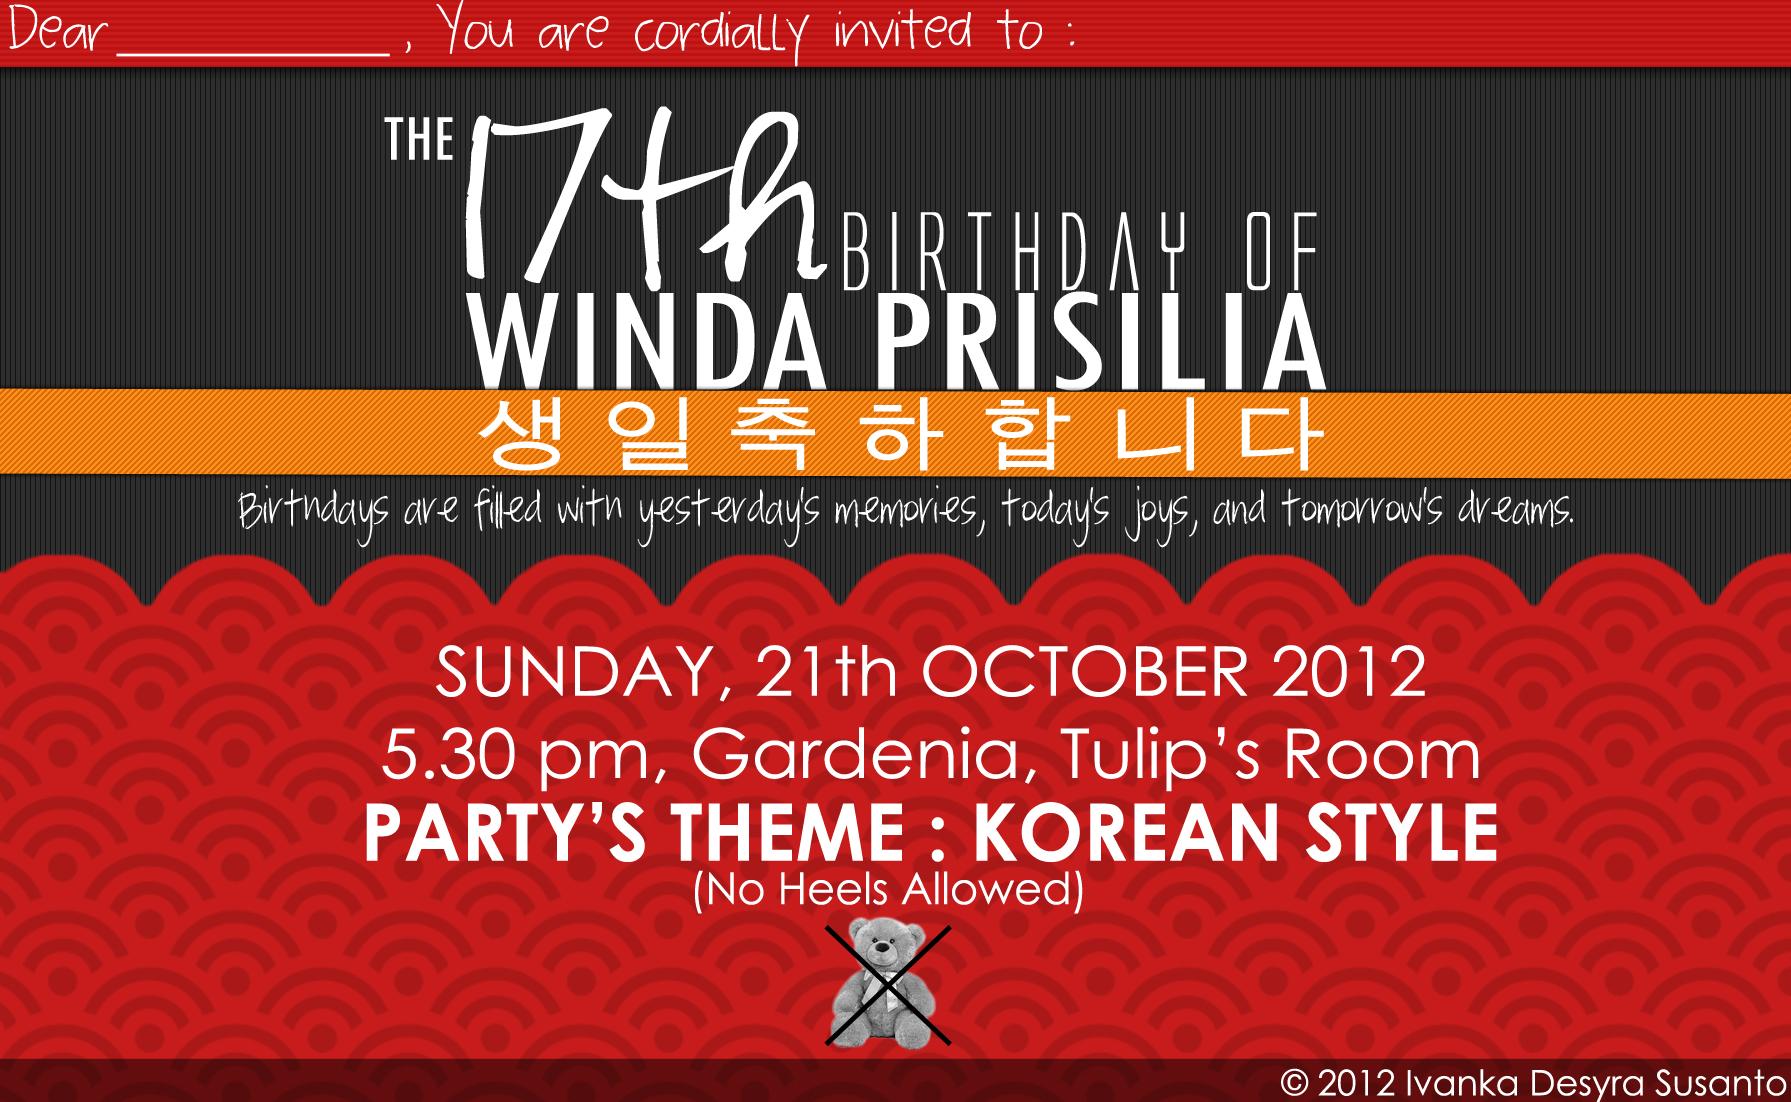 17 birthday invitation card design korean style by ivnkadsyra on 17 birthday invitation card design korean style by ivnkadsyra stopboris Choice Image